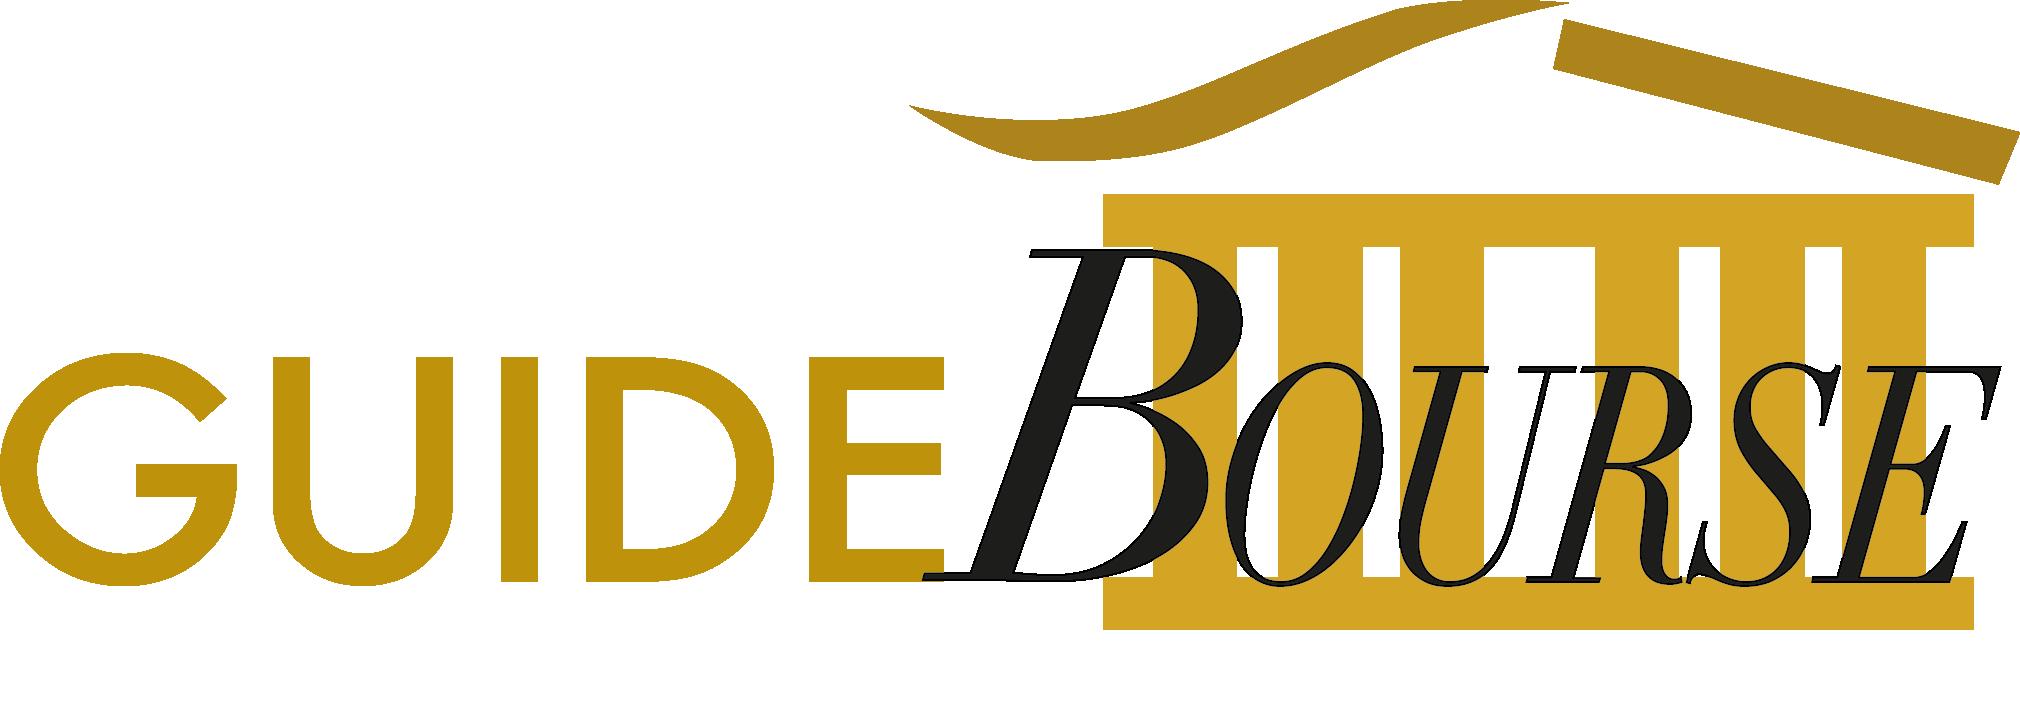 business letterhead template office